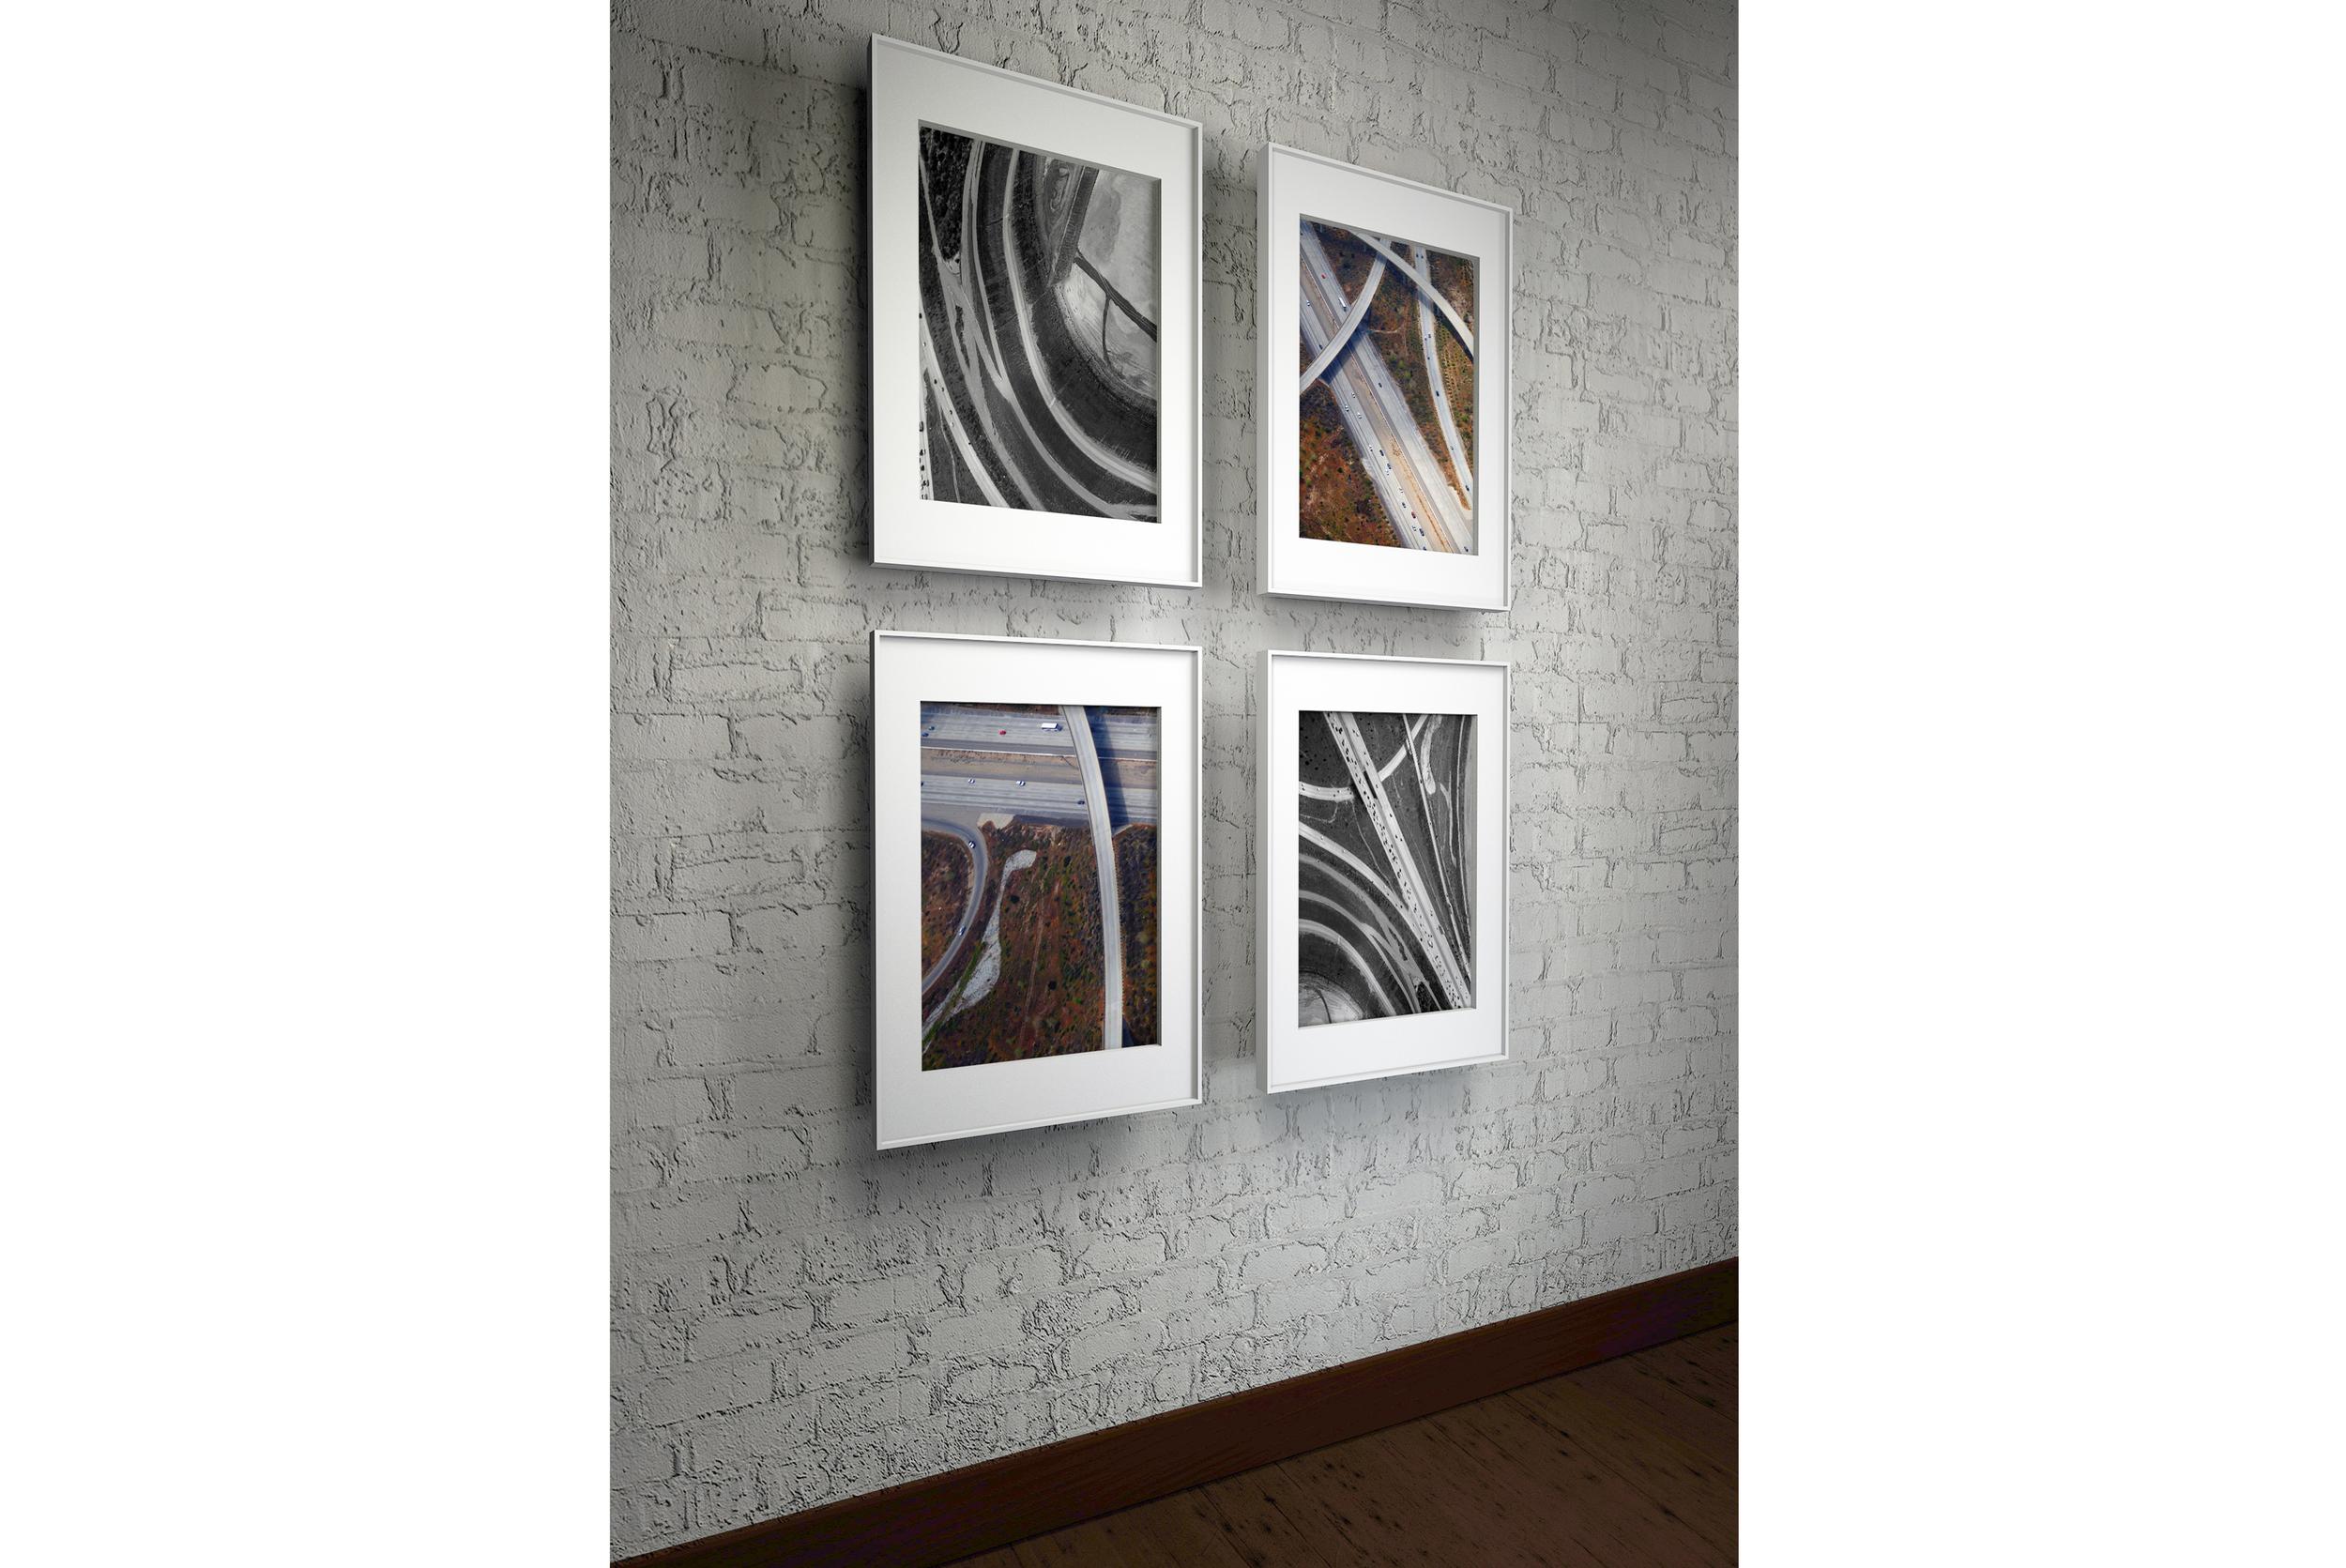 gallery framed mother board.jpg